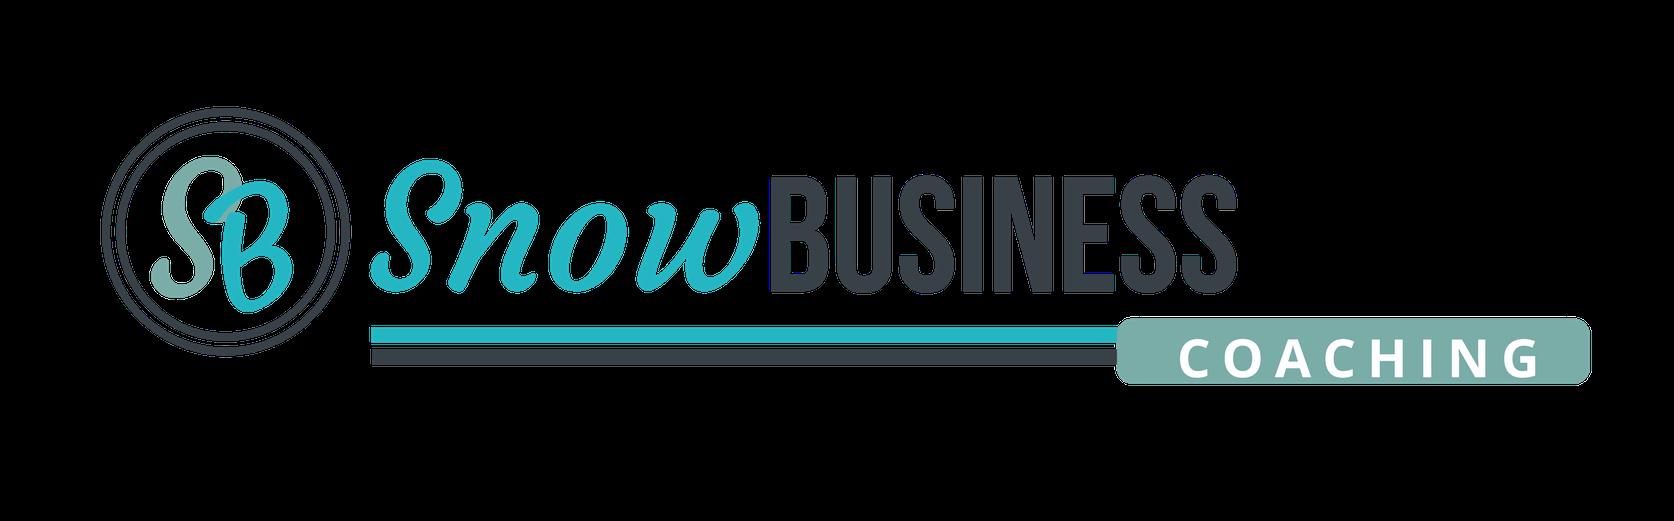 Snow Business Coaching - Logo.png